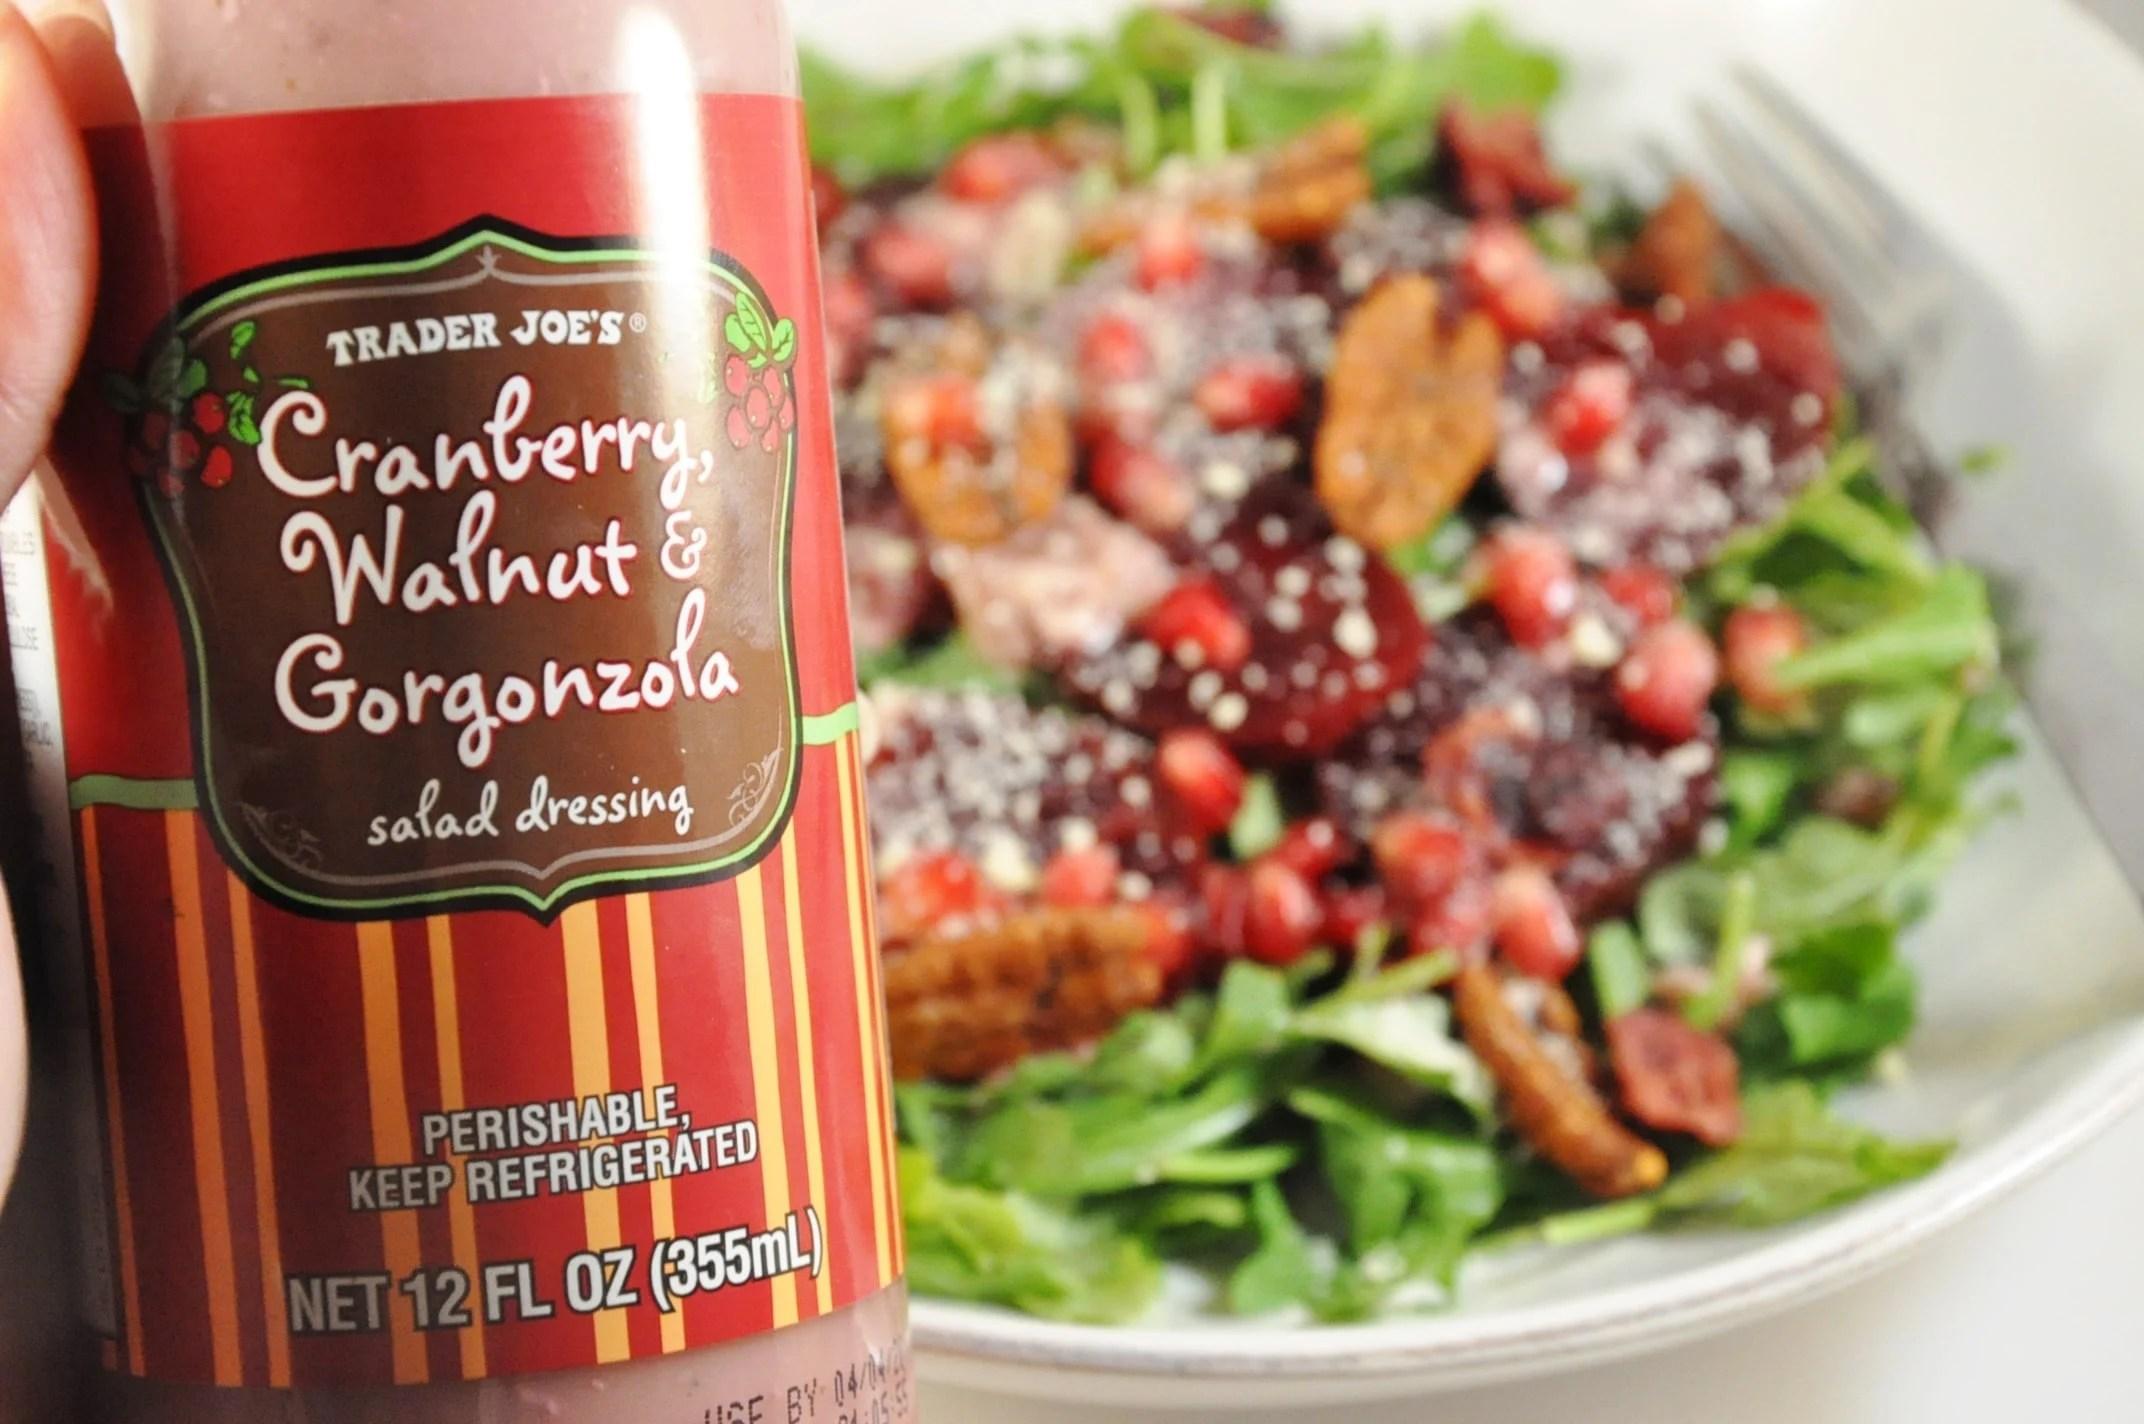 Trader Joe's Cranberry, Walnut & Gorgonzola Dressing